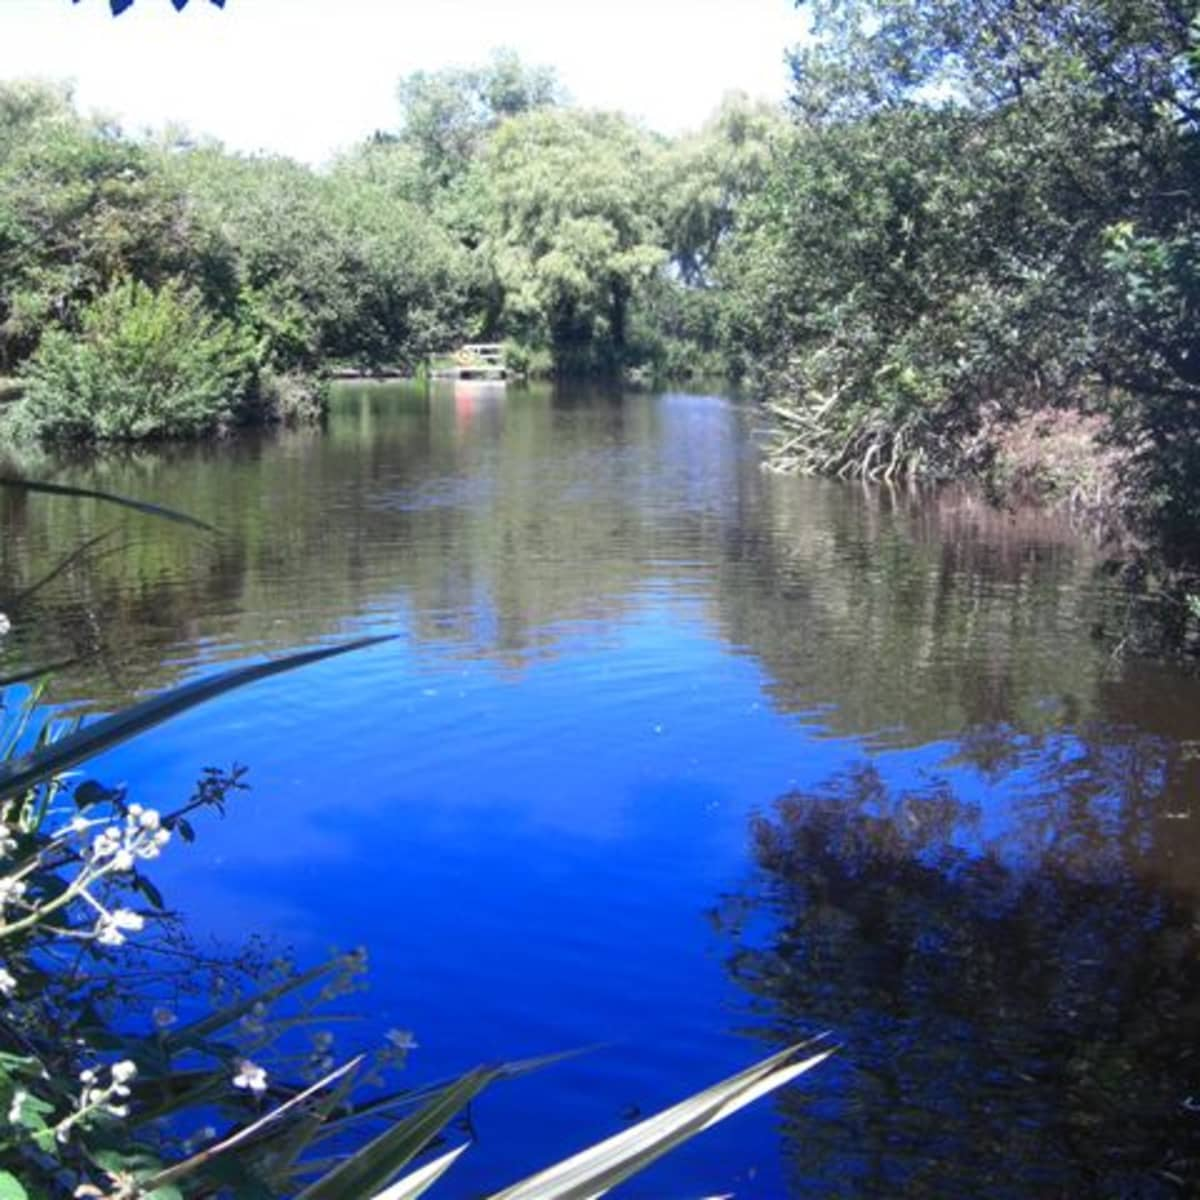 How To Build An Artificial Fishing Lake Dengarden Home And Garden